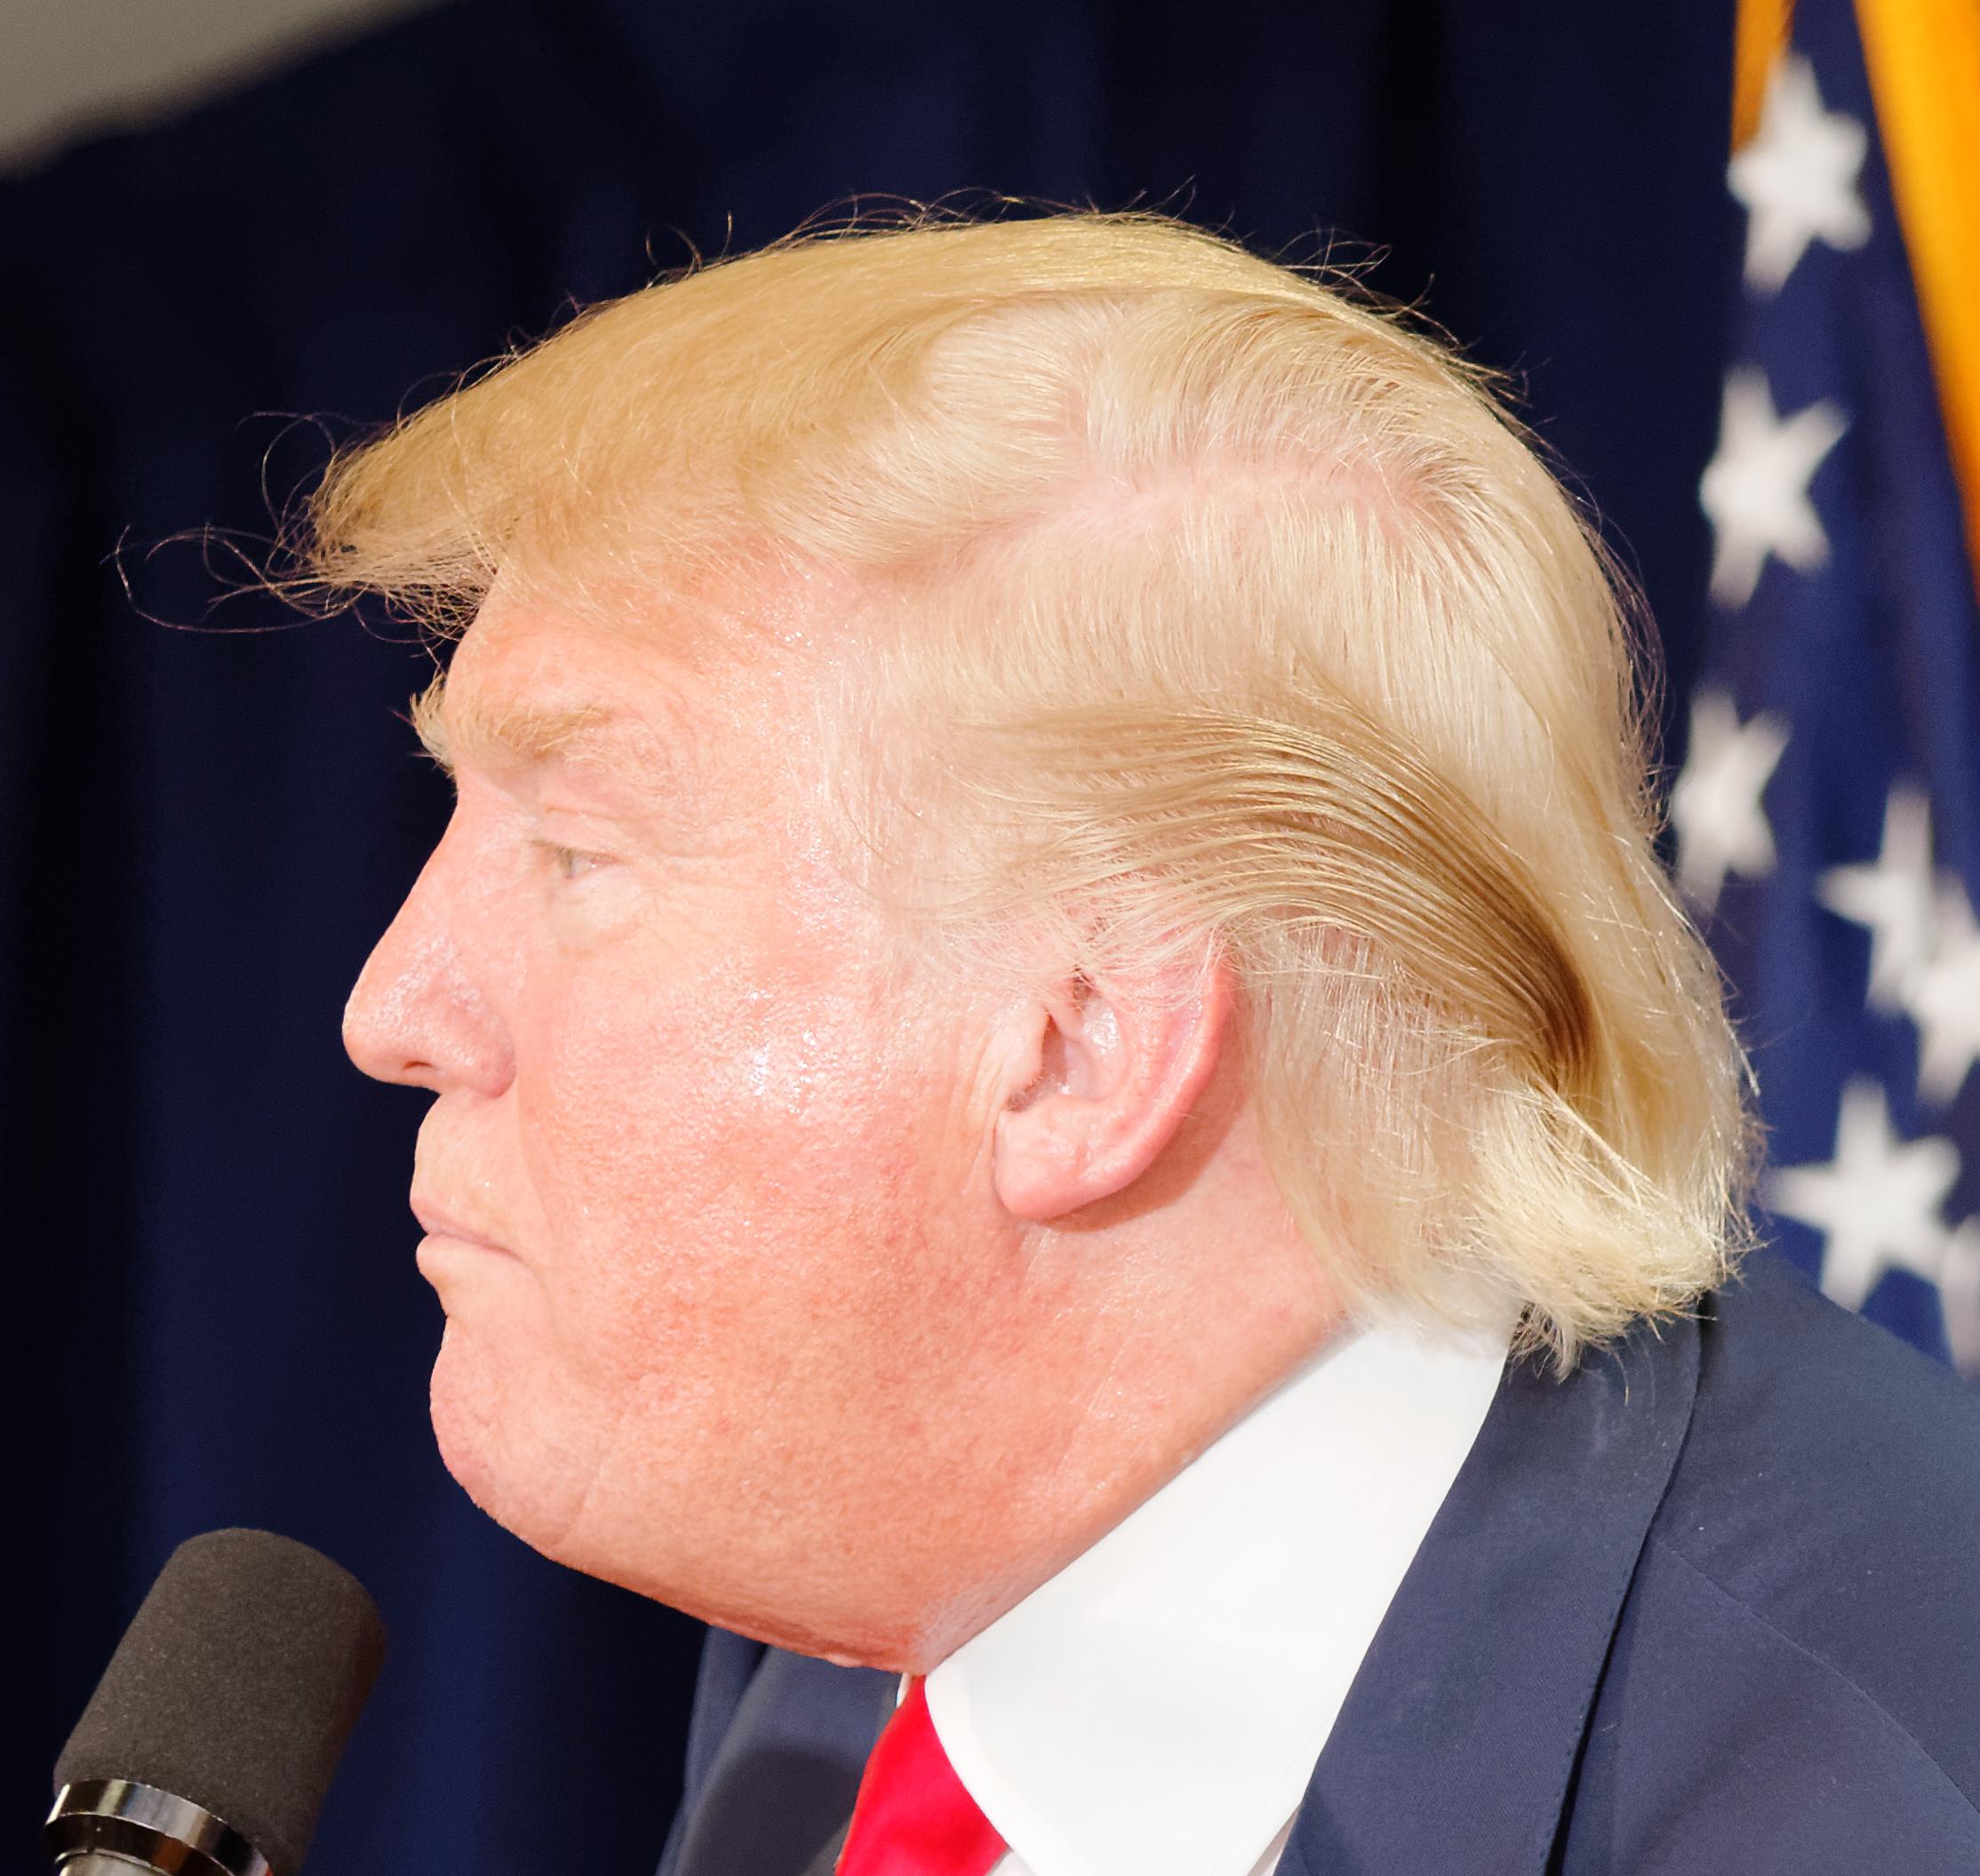 Trump Hairspray In Hotel Room Global Warming Theory